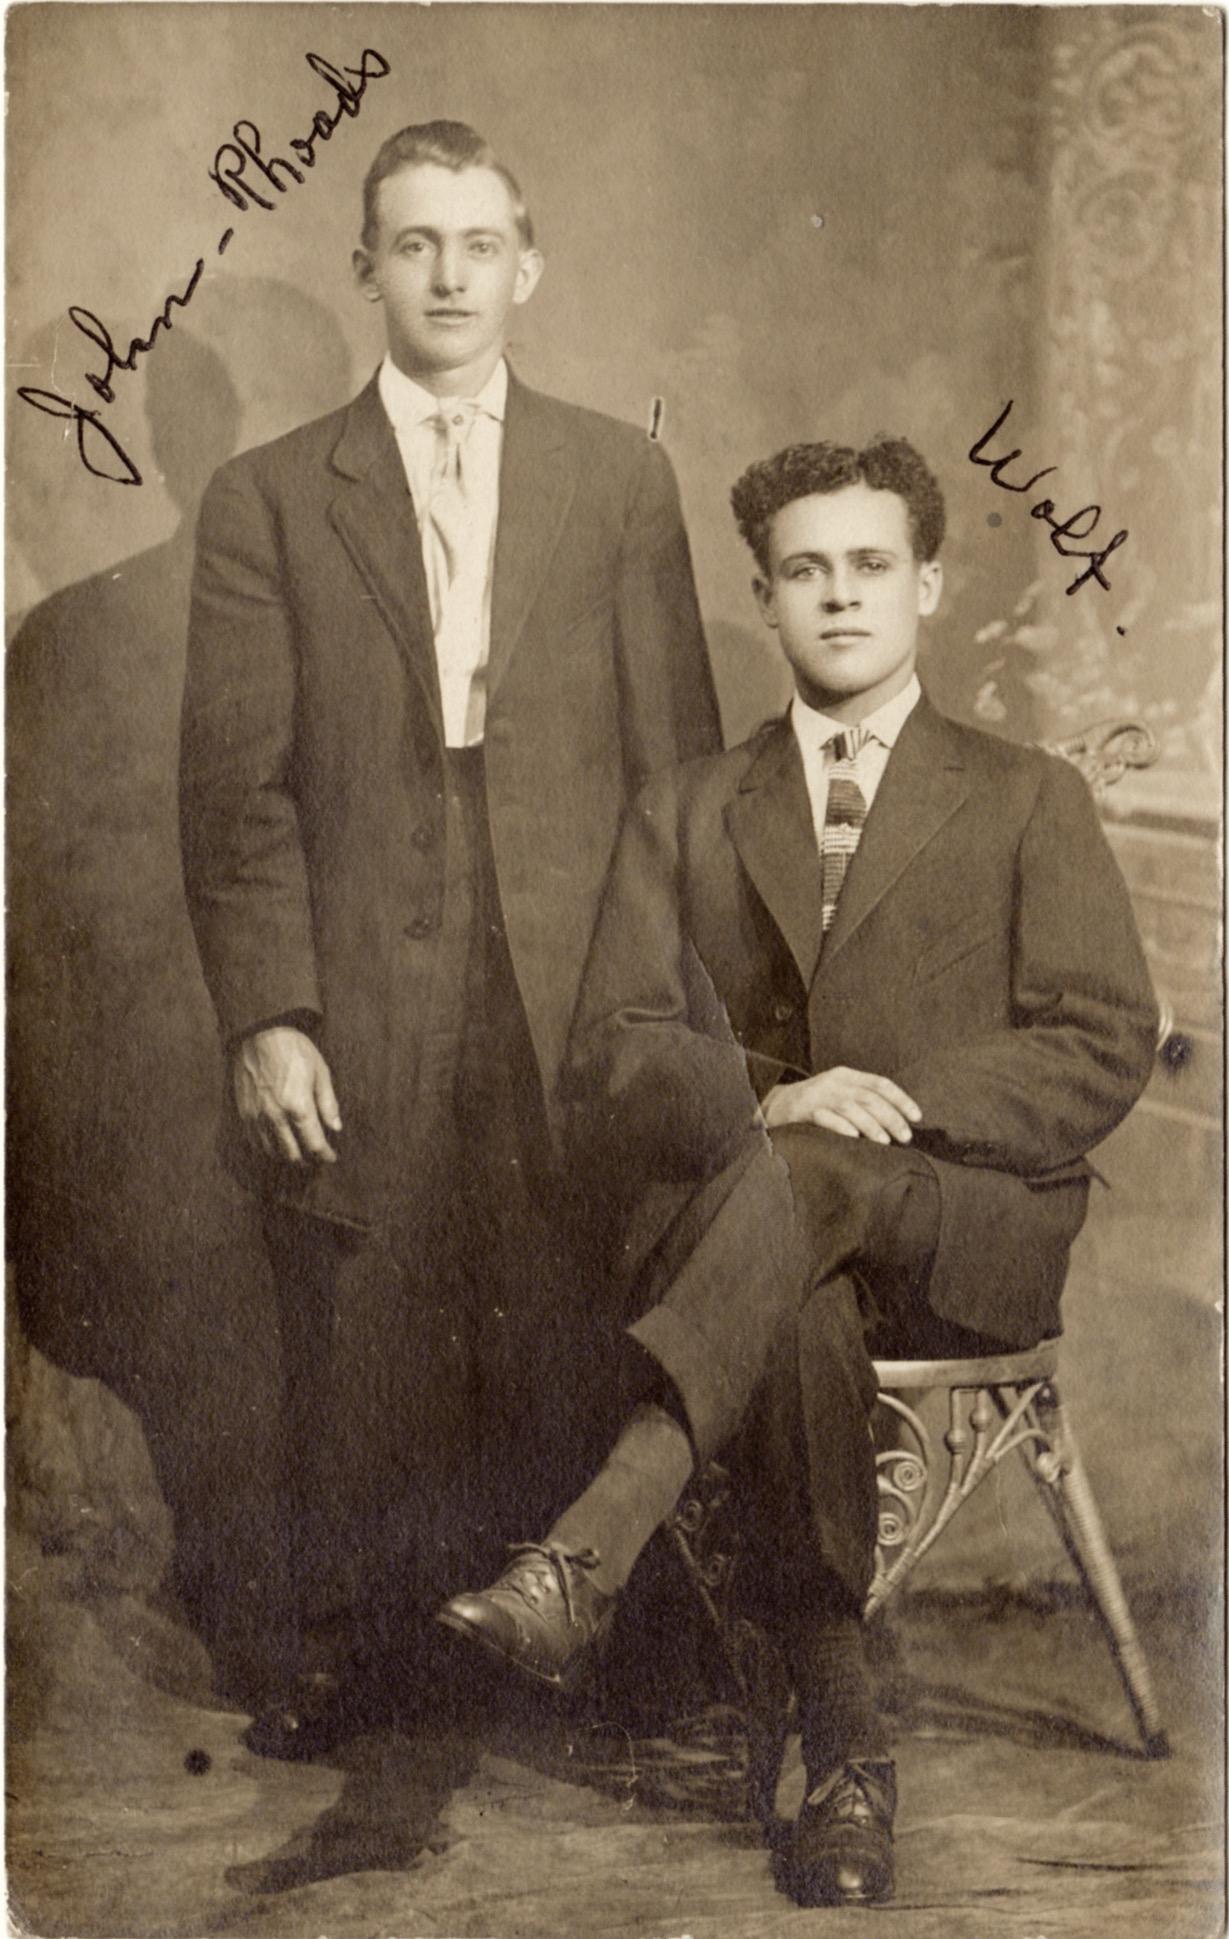 John Rhoads and Mr. Wolf